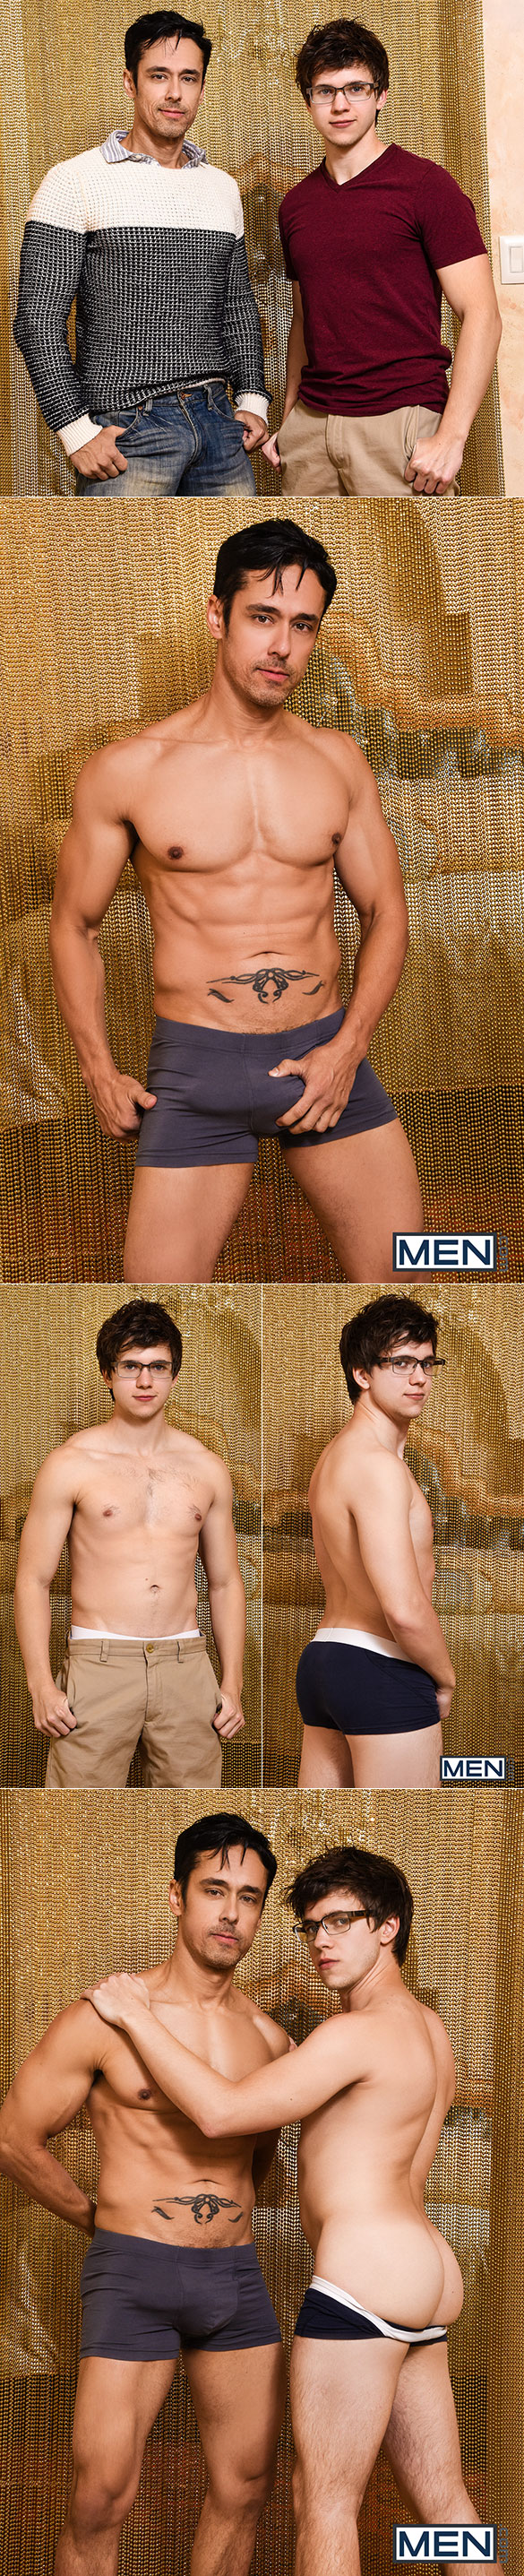 "Men.com: Will Braun rides Rafael Alencar's thick cock in ""Pursuing the Bait"""